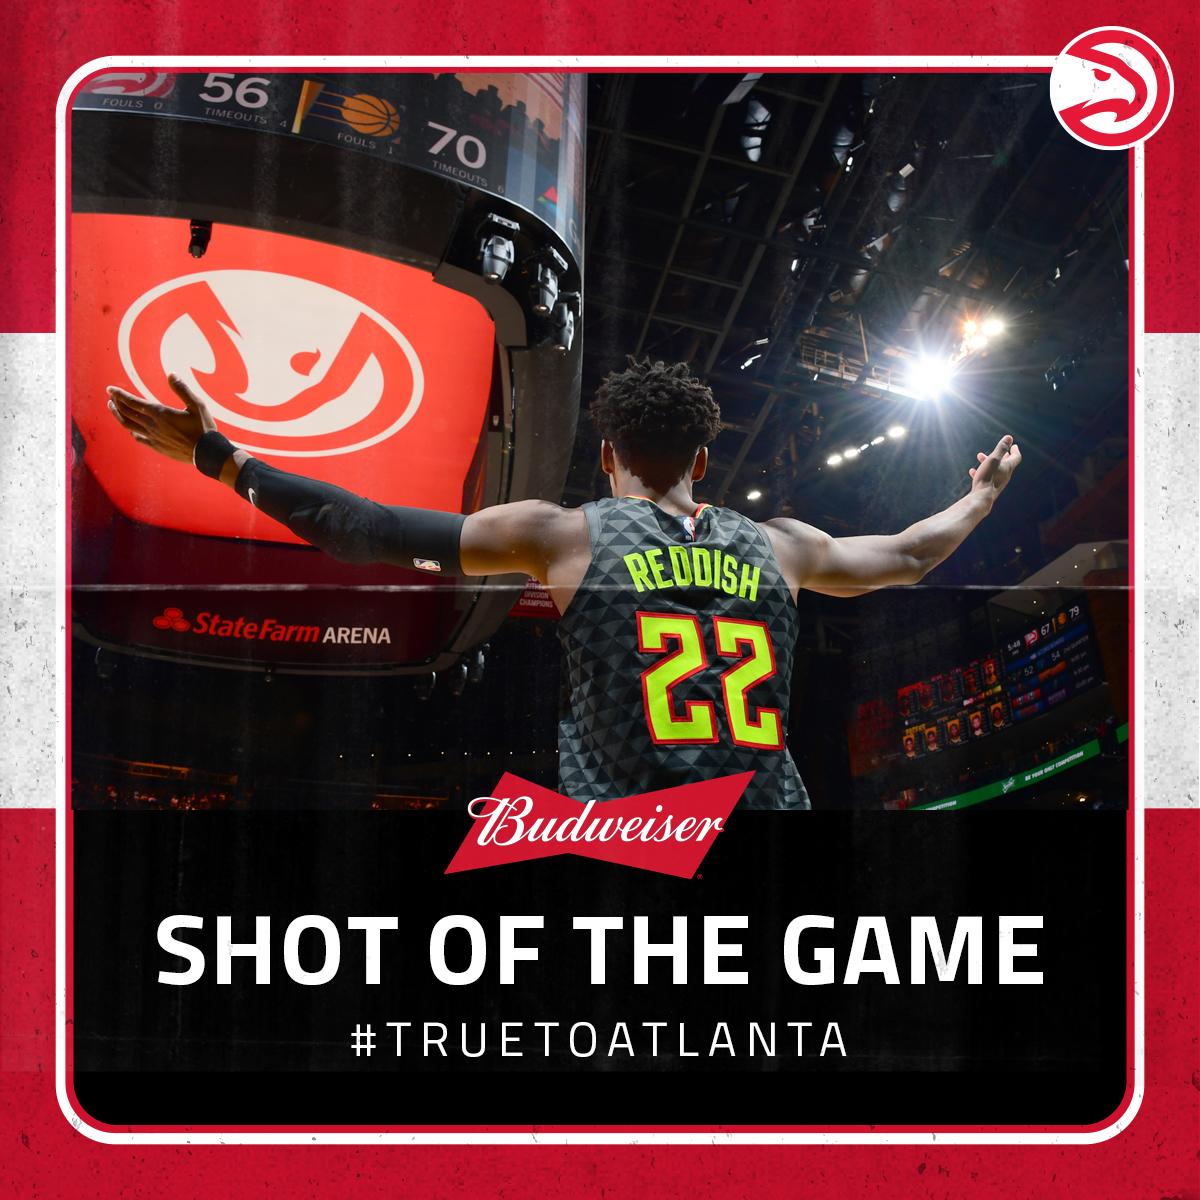 📸 Shot of the Game 📸  #TrueToAtlanta | @budweiserusa